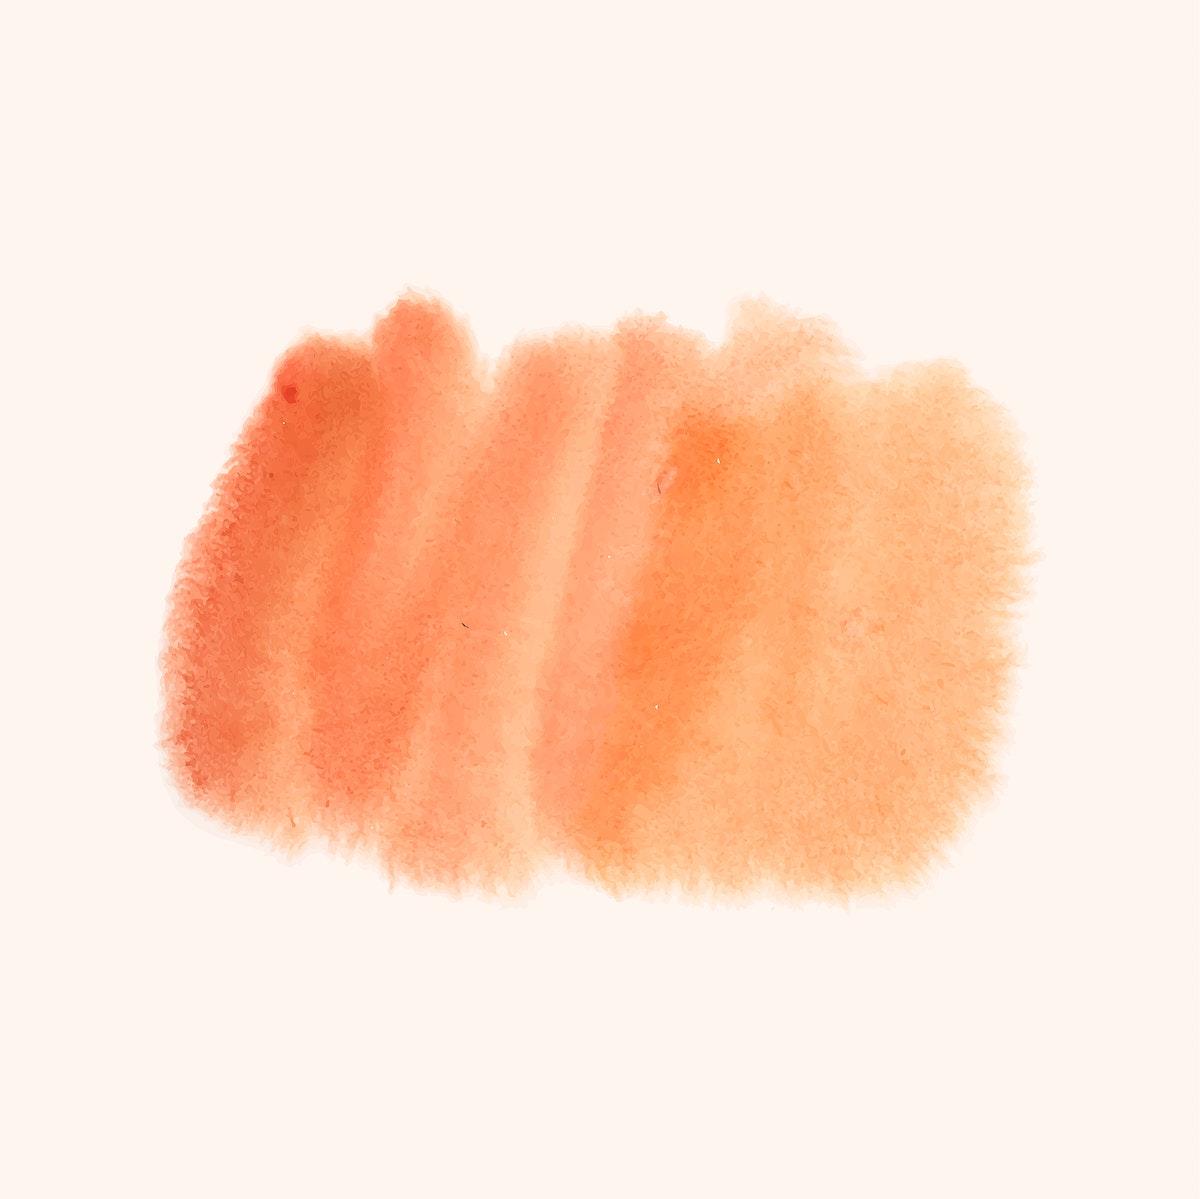 Orange watercolor style banner vector